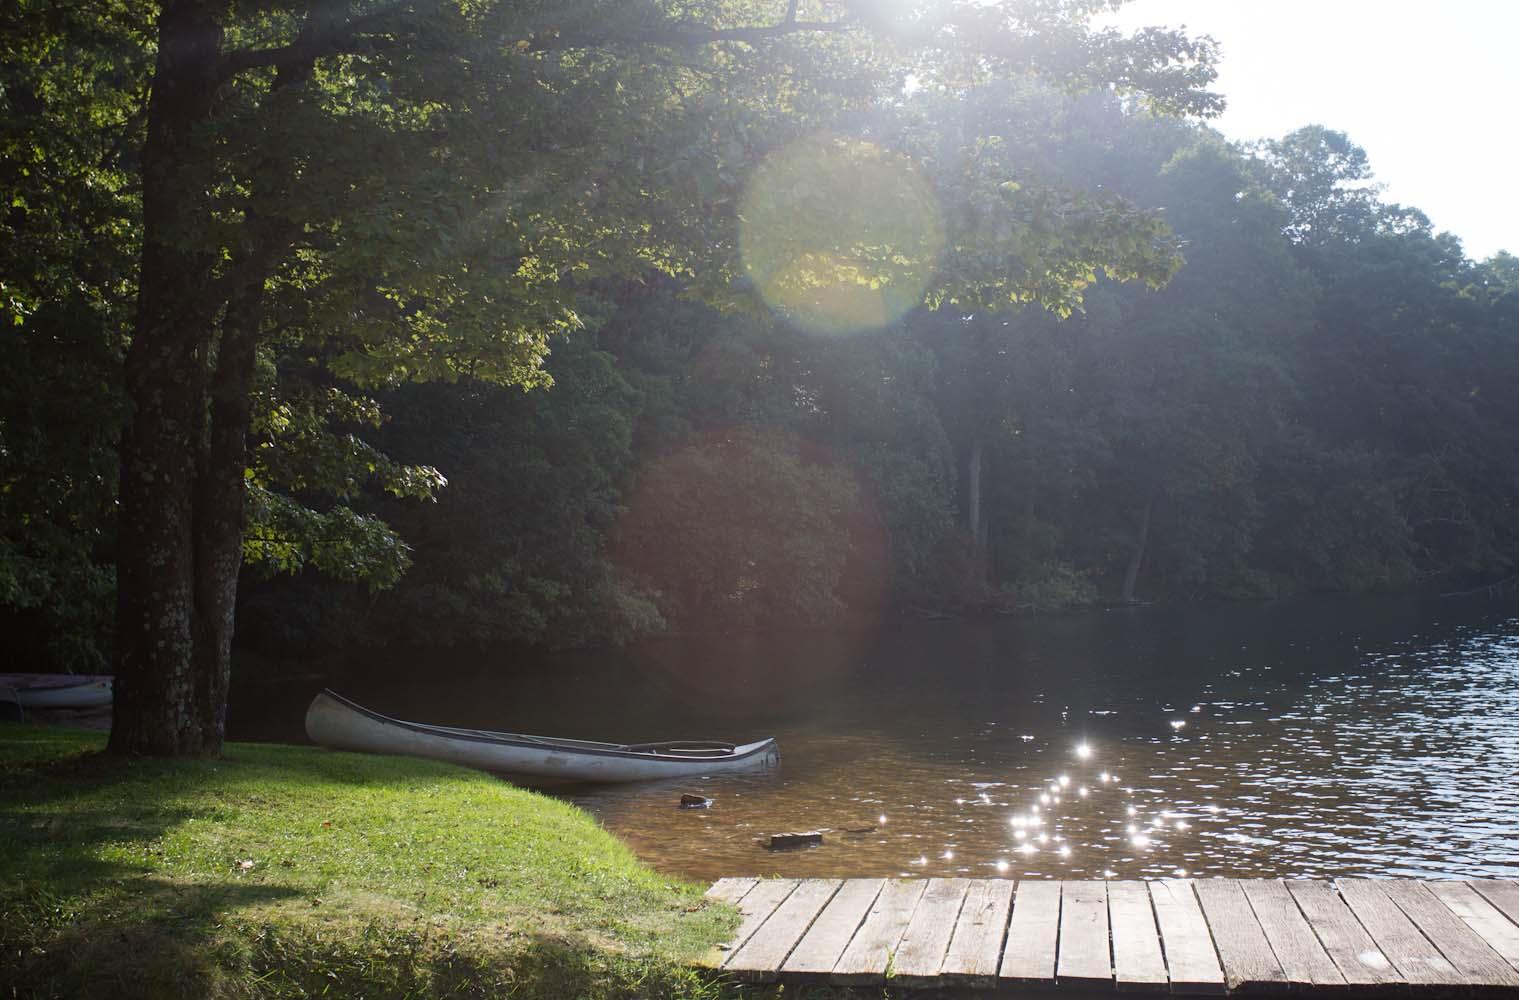 tate_canoe-2156.jpg